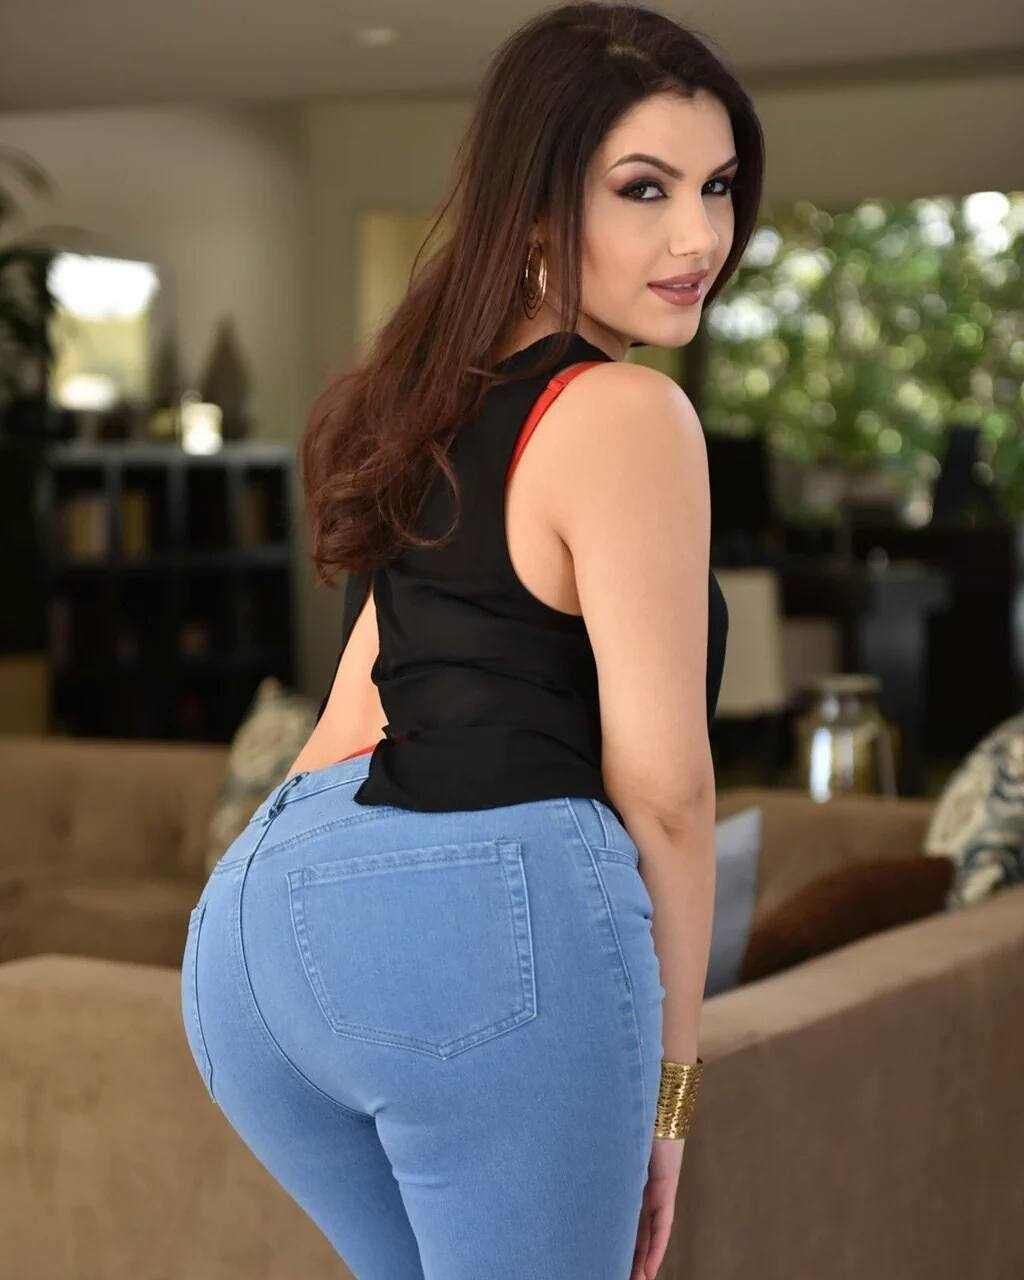 Valentina Nappi Bio, Wiki, Age, Net Worth, Figure, Lifestyle